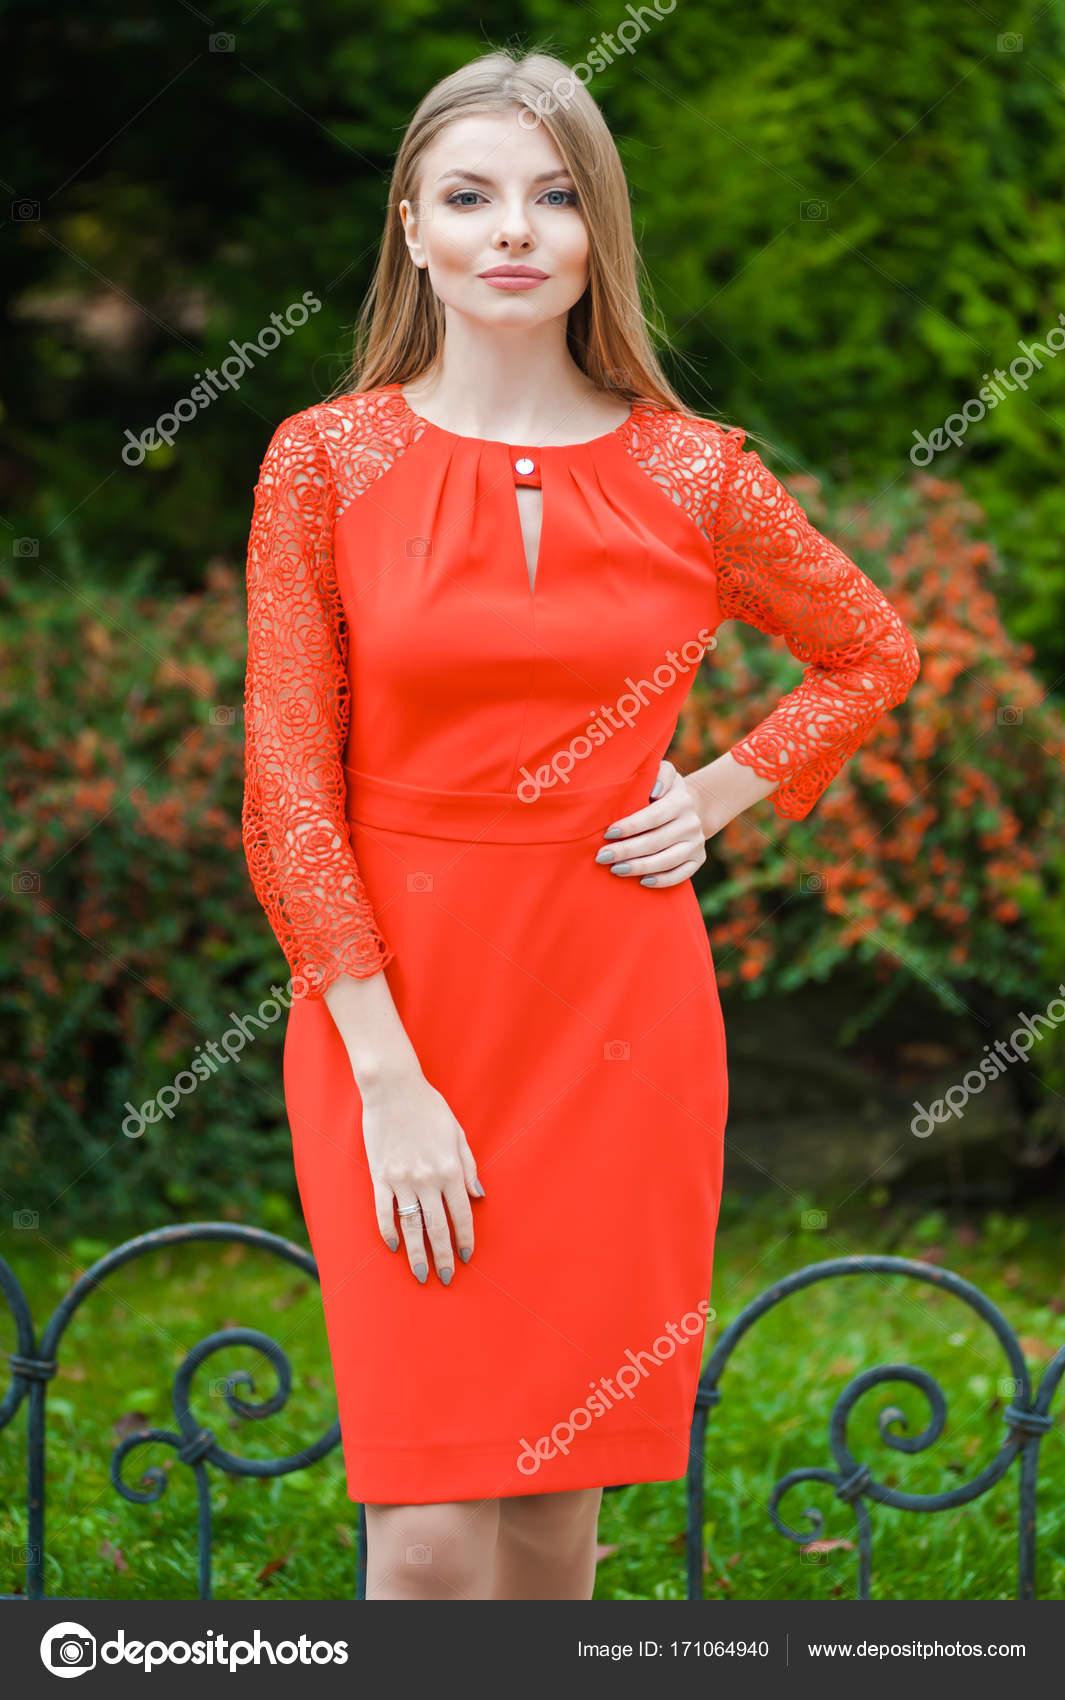 schöne Mädchen in kurzen roten Kleid — Stockfoto © alipko #171064940